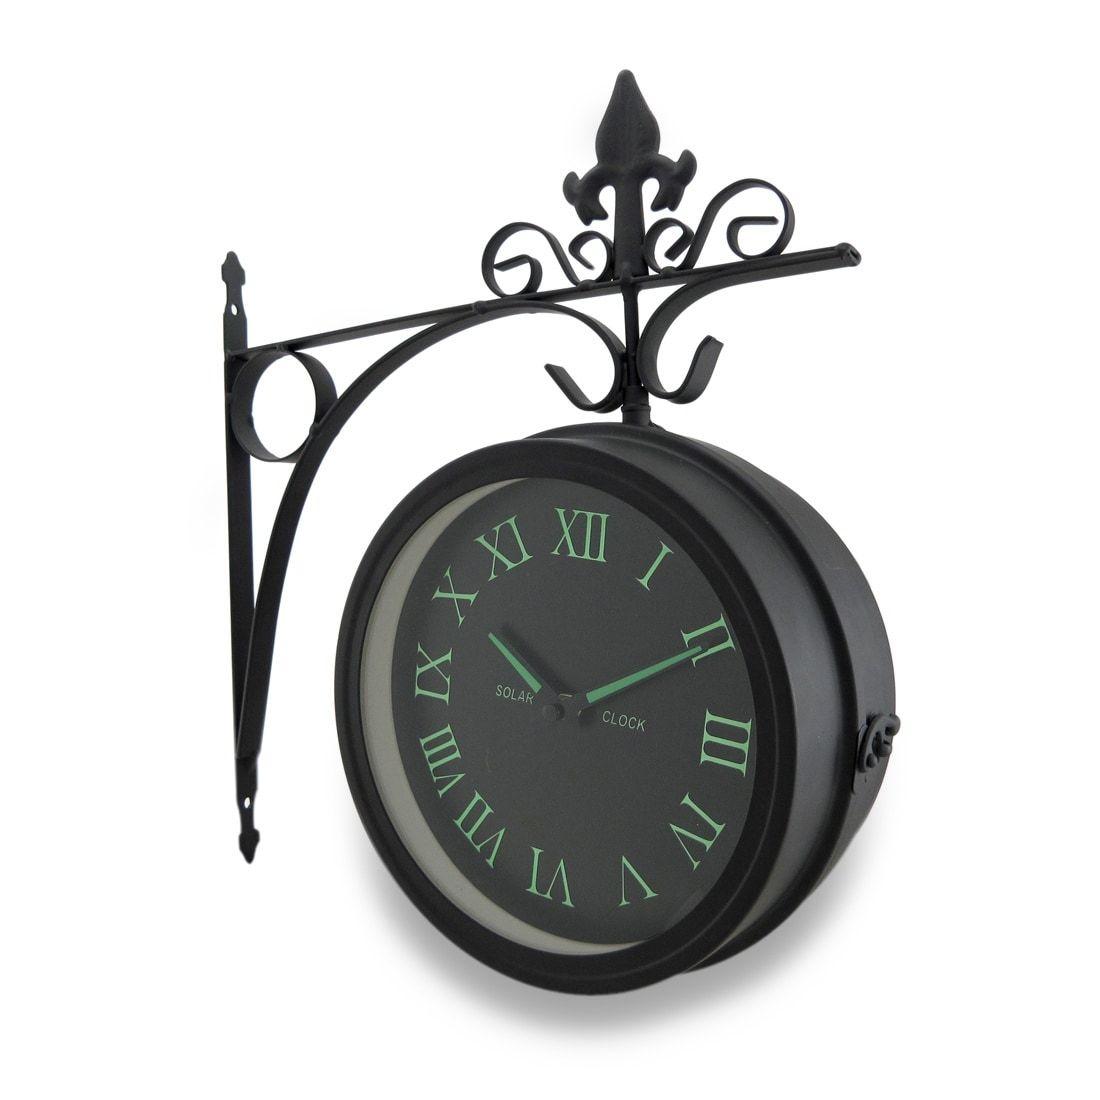 Double Sided Glow In The Dark Wall Clock W/Decorative